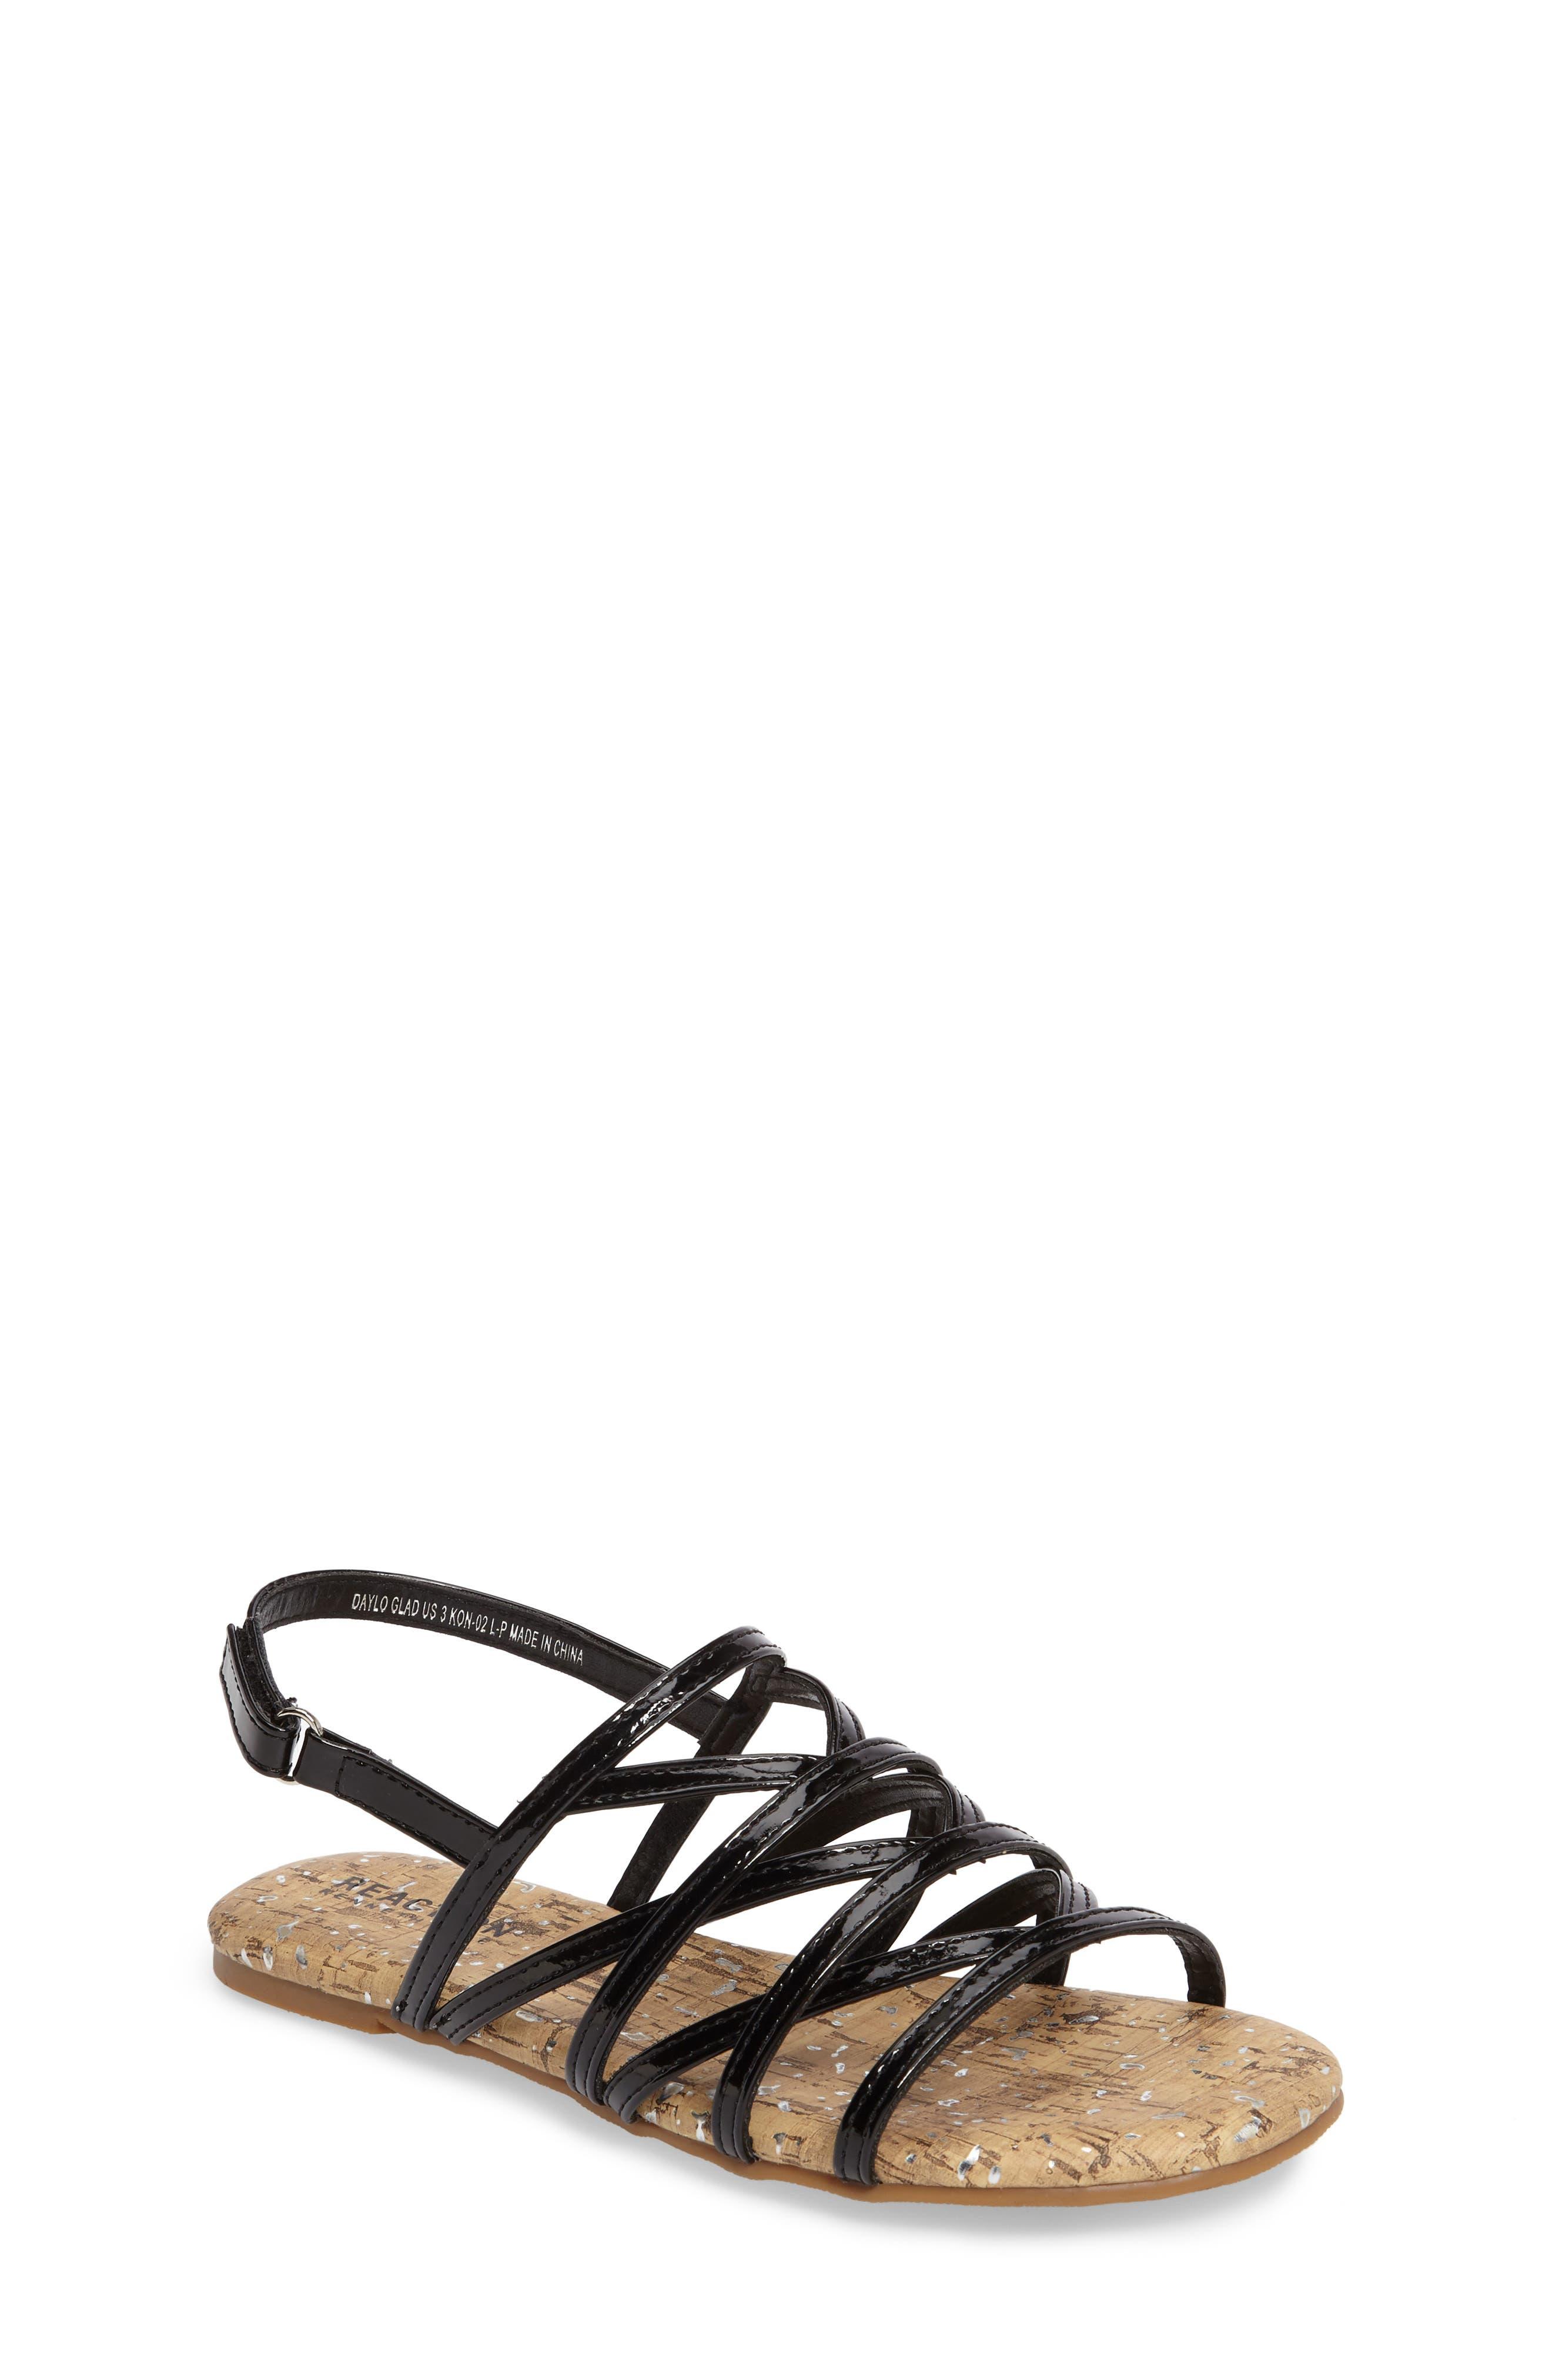 Daylo Glad Strappy Sandal,                         Main,                         color, 007